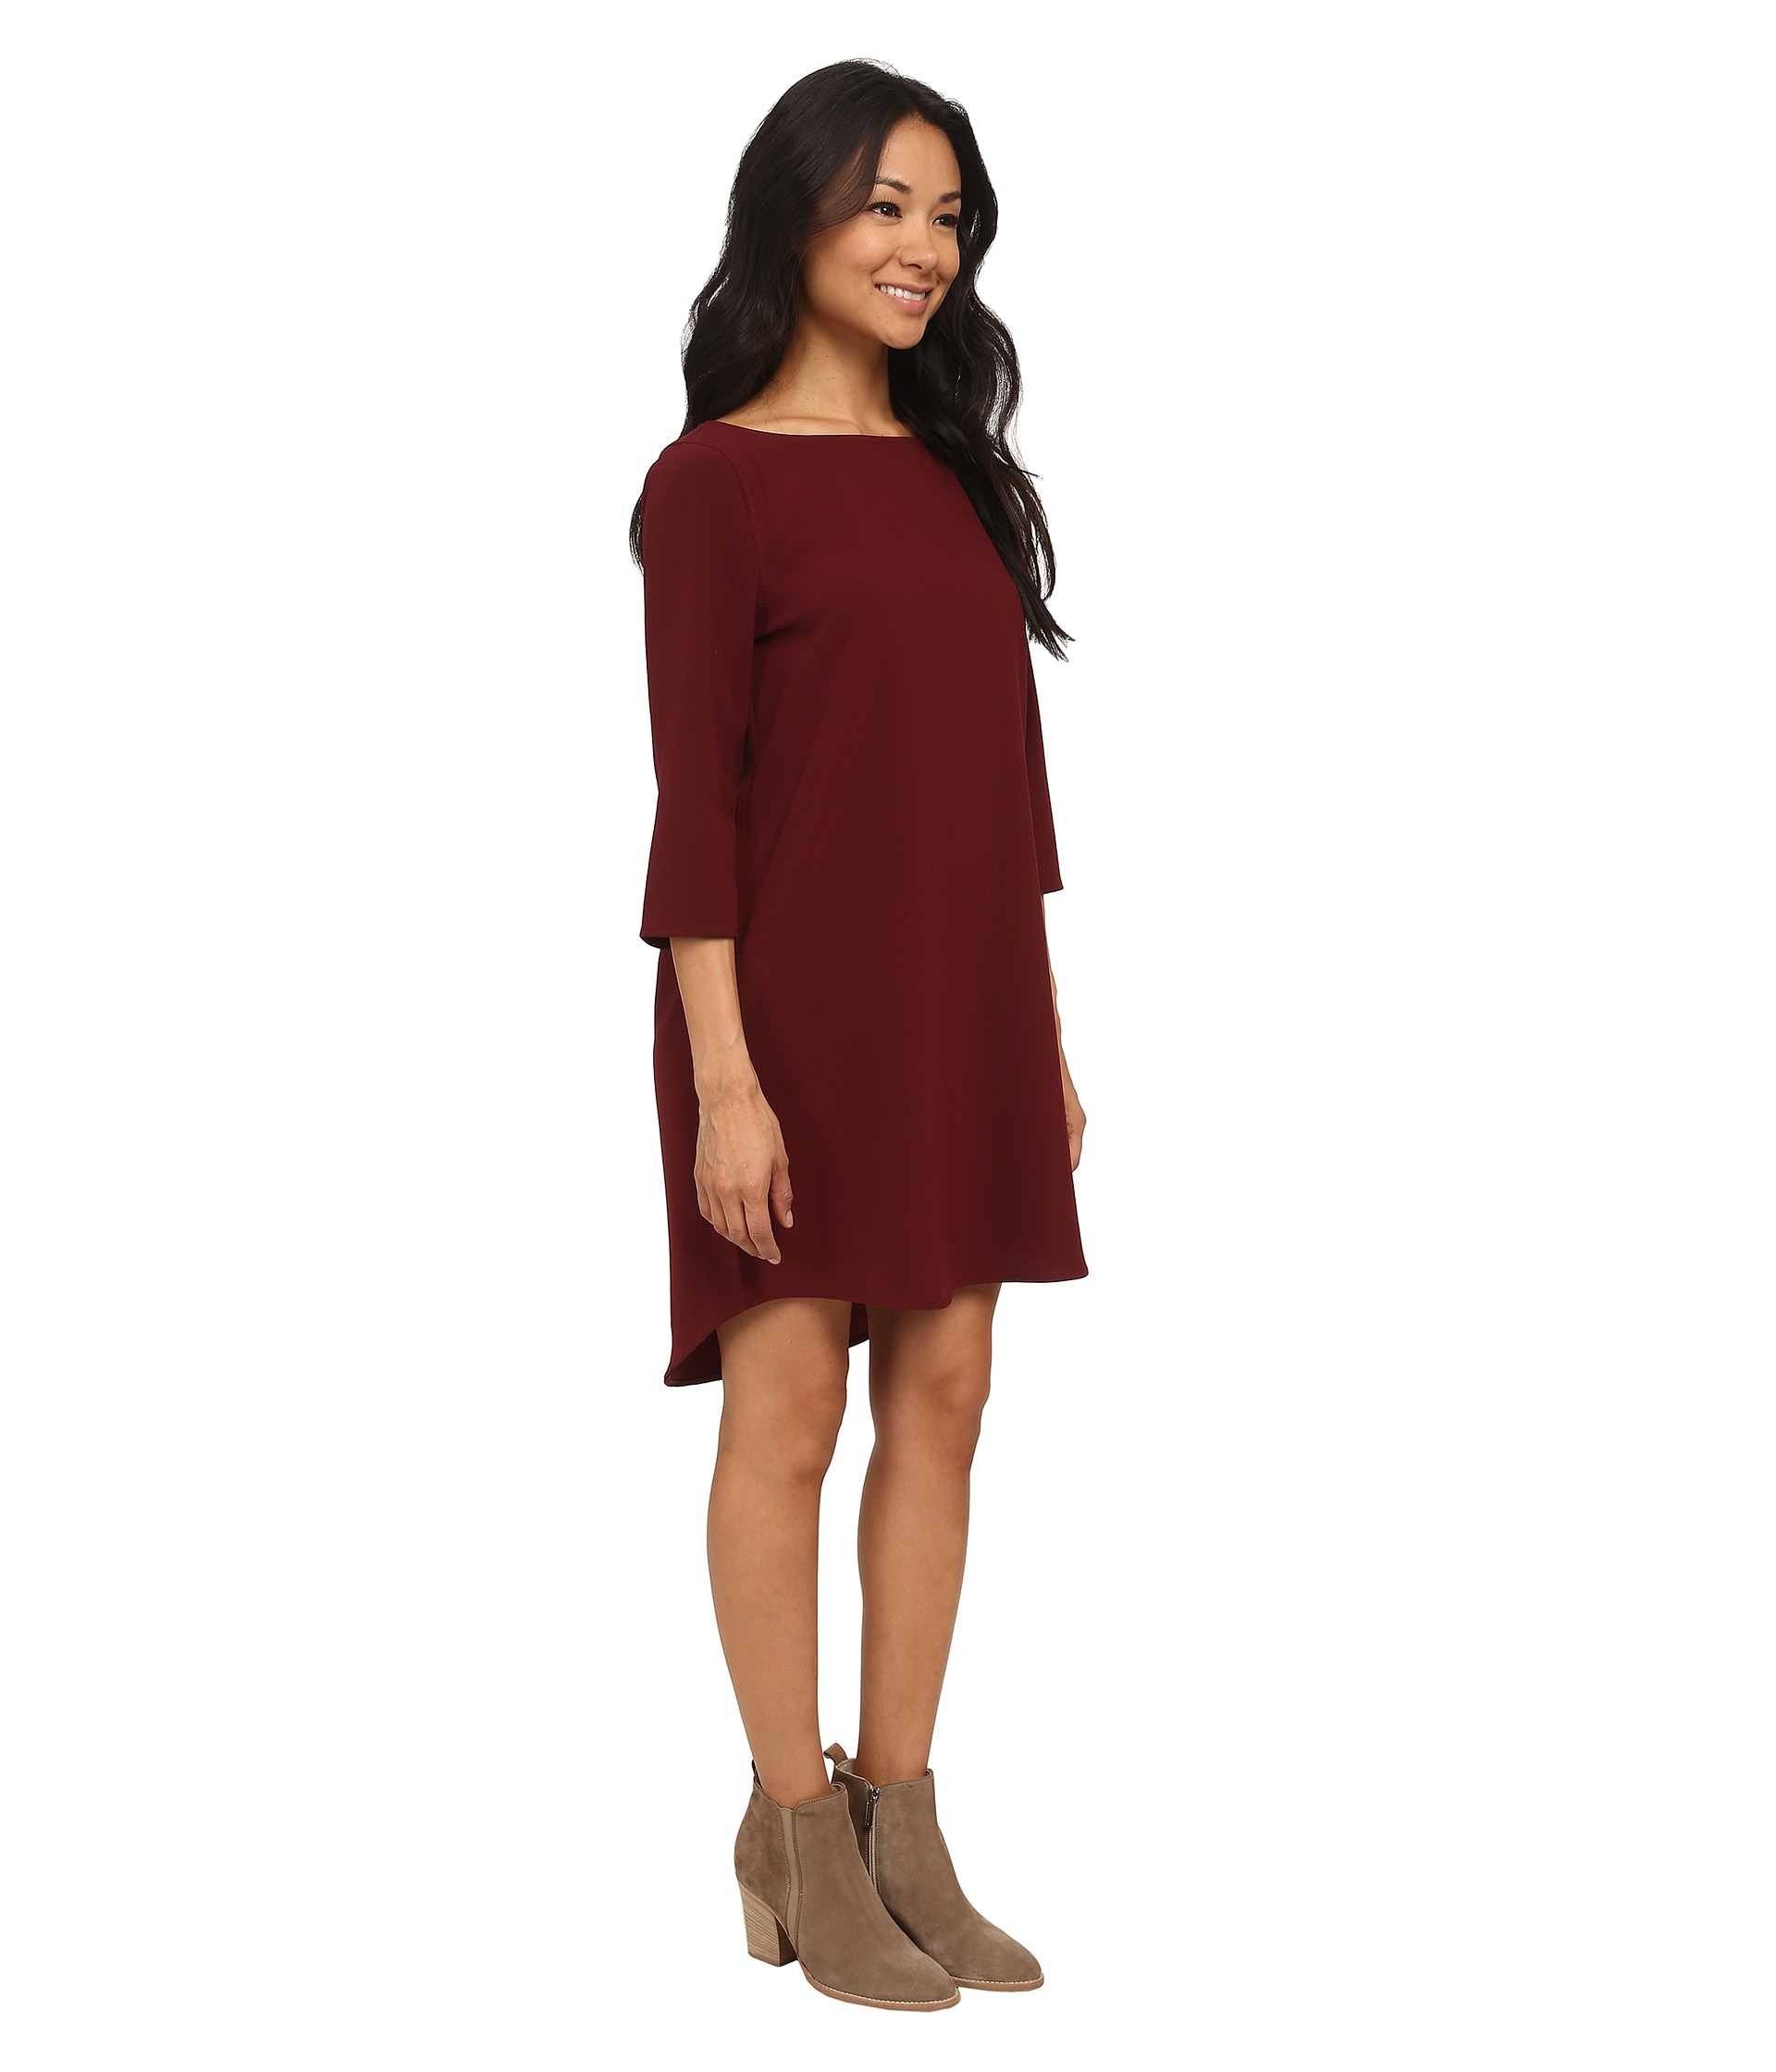 Lyst - BB Dakota Devin Long Sleeve Crepe Shift Dress in Red cb0759898